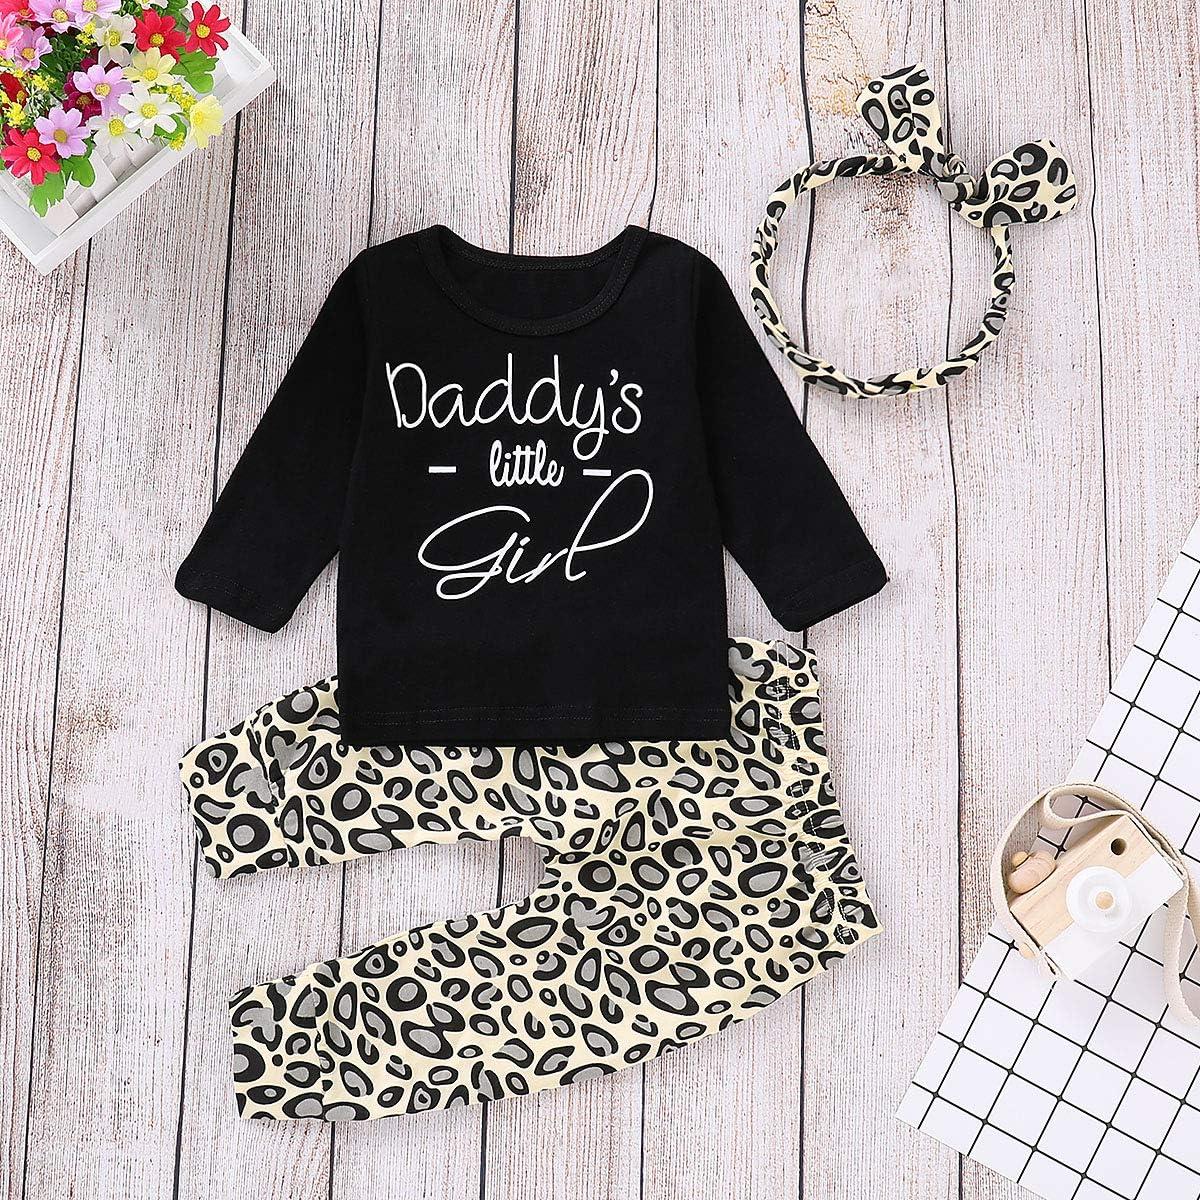 3er Set Neugeborene Baby M/ädchen Outfits Daddys Litter Girl Print Langarm Leopard T-Shirts Tops Leggings Baby Kleidung Sets